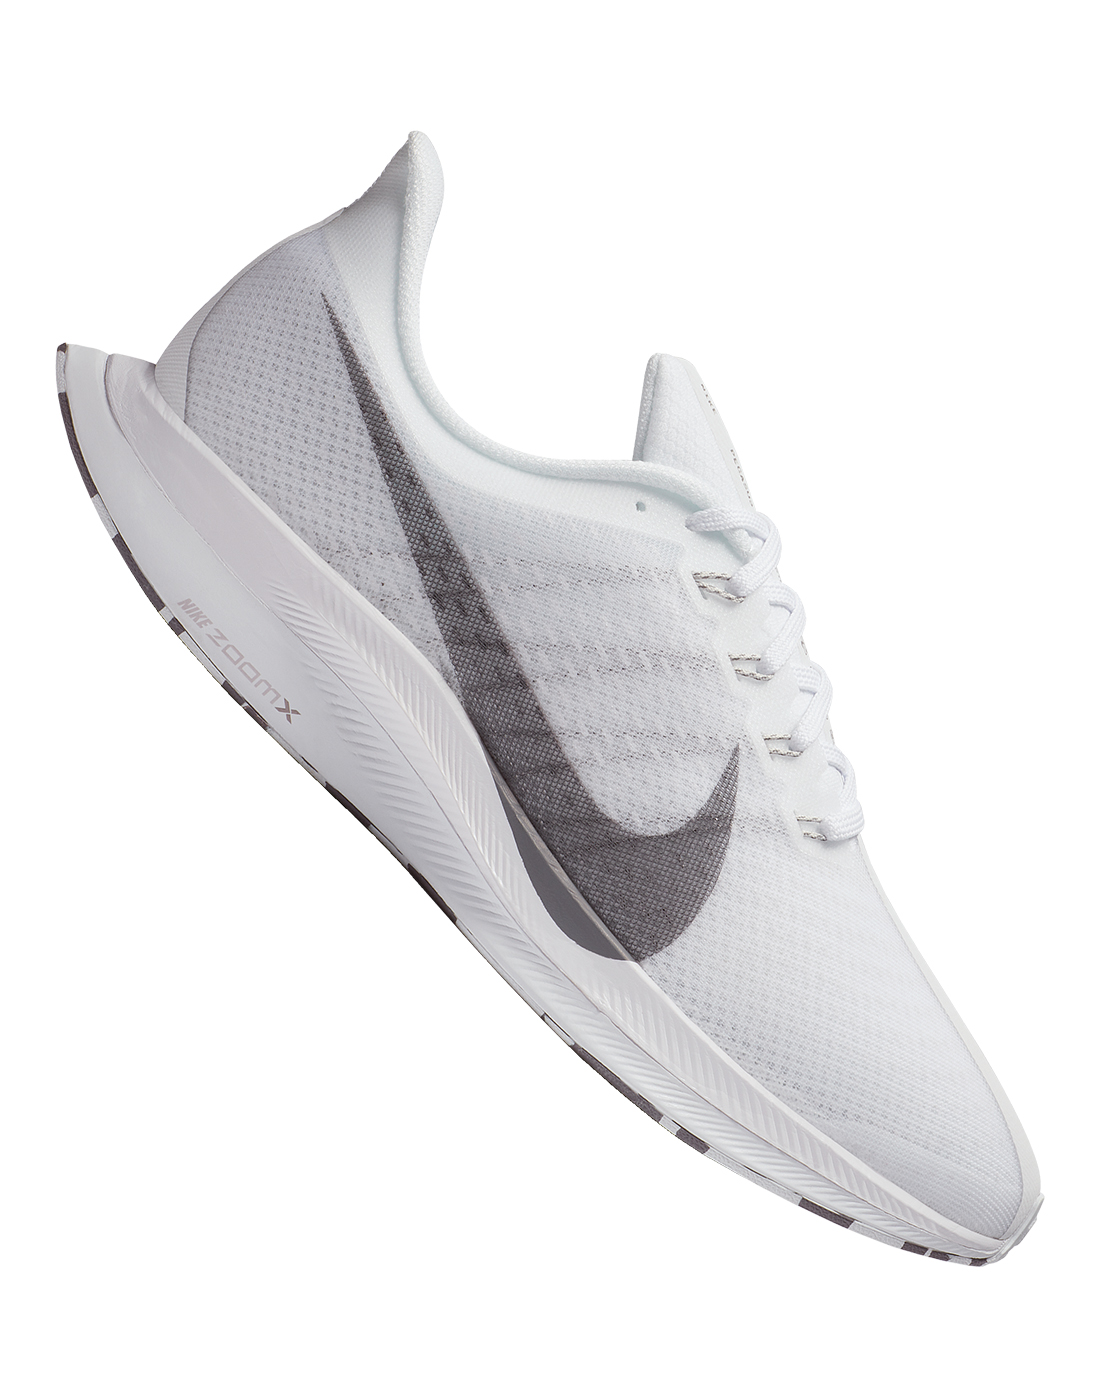 6914ae00206b Men s White Nike Zoom Pegasus Turbo